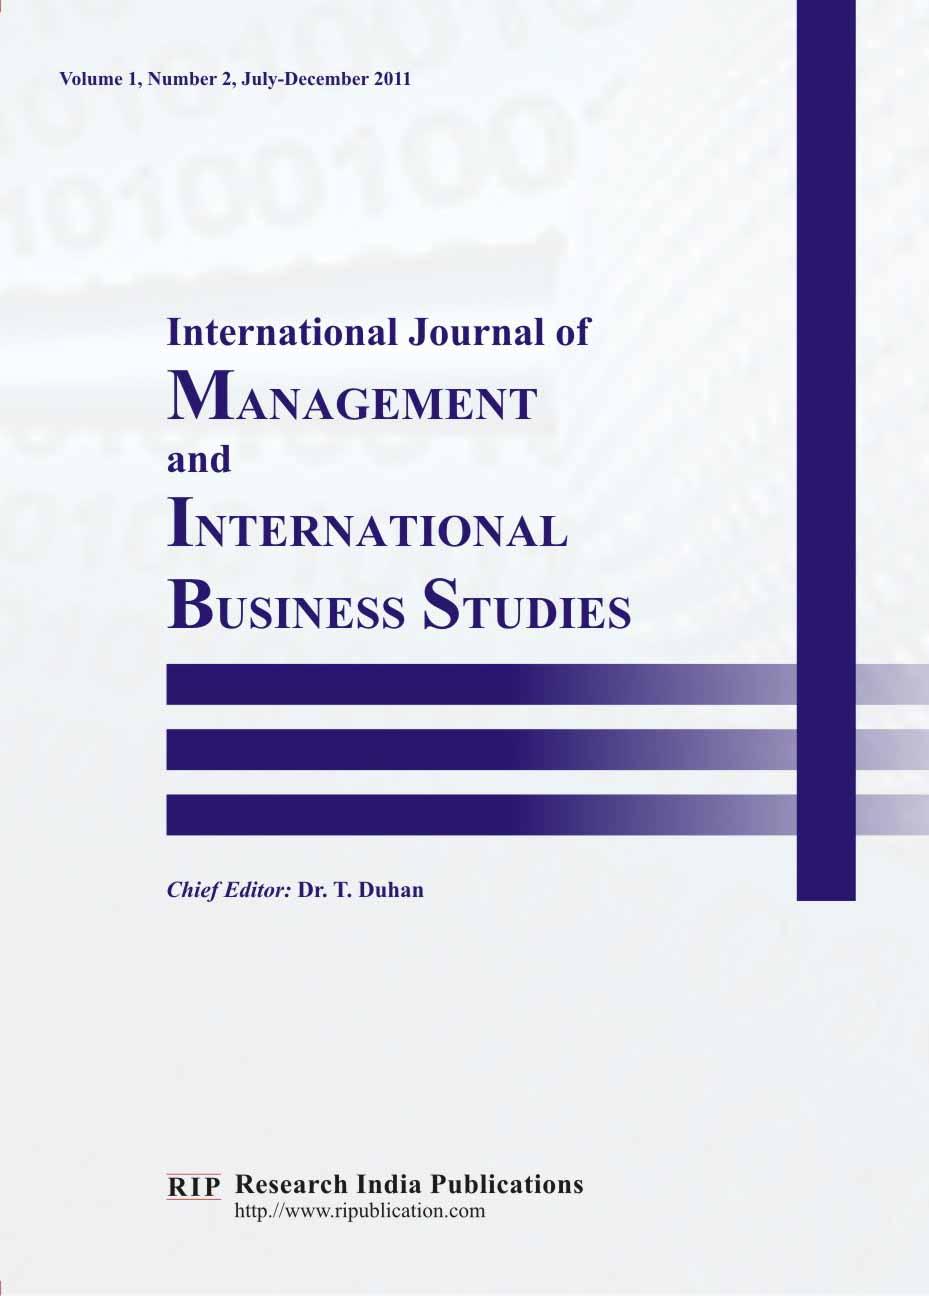 IJMIBS, International Journal of Management and International